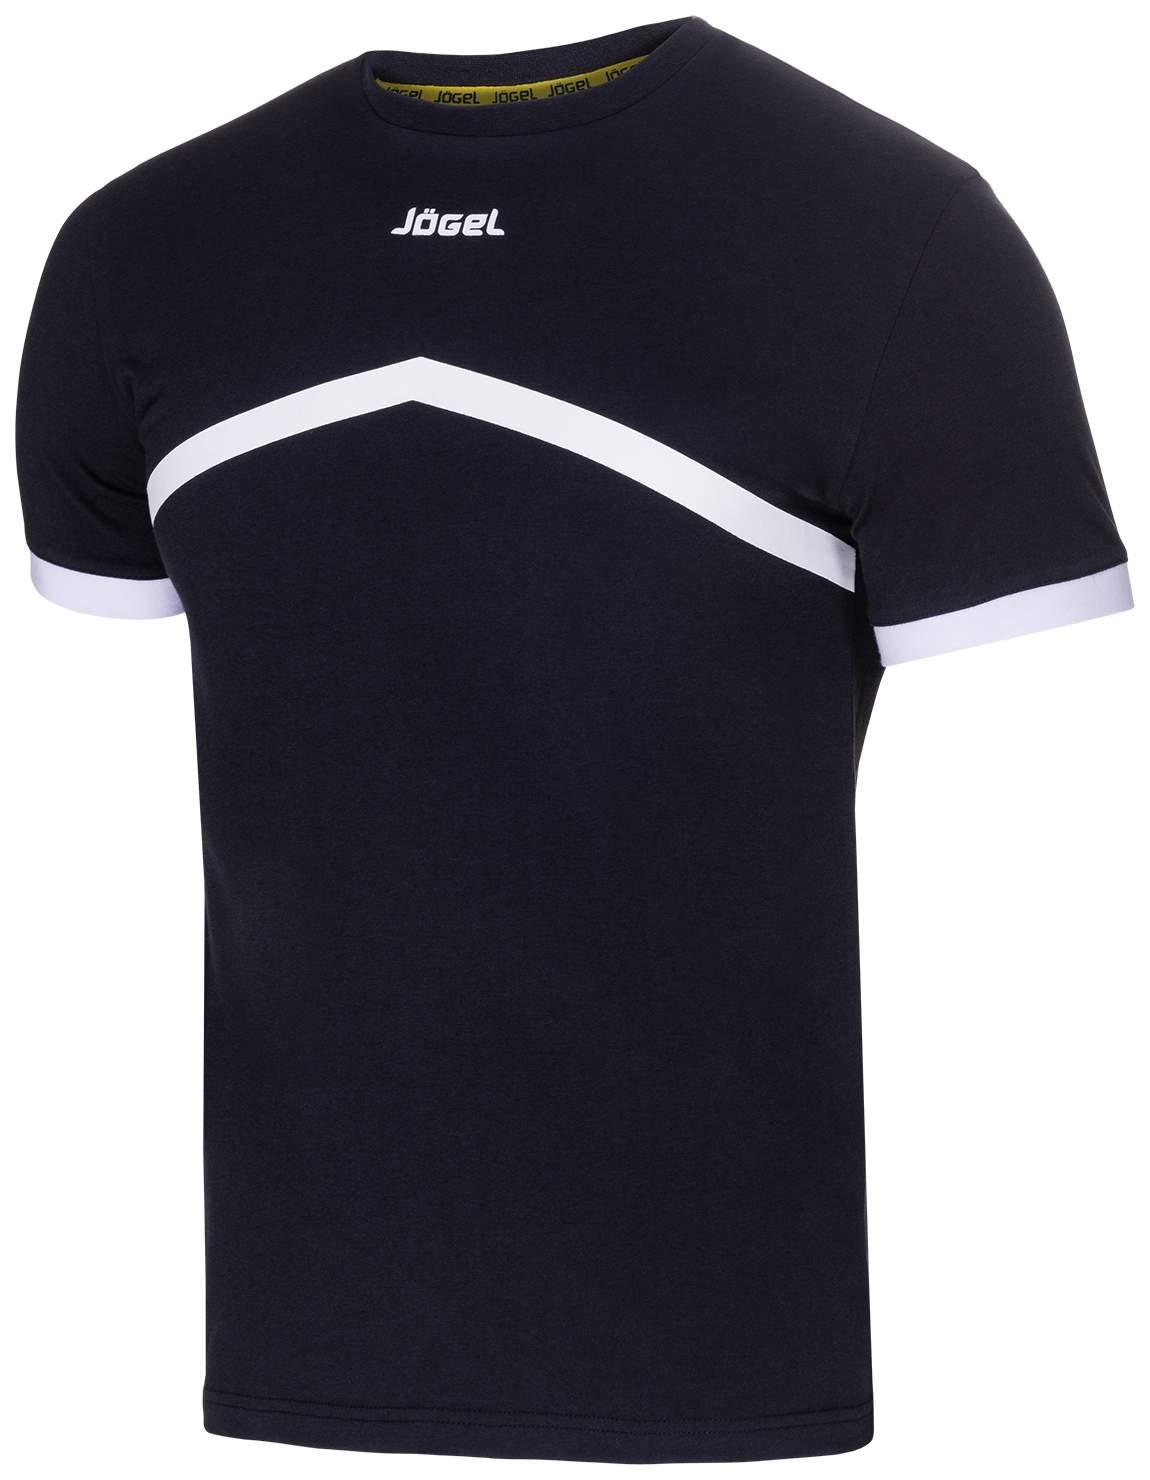 ФутболкаJOGEL JCT-1040-061 черный YM